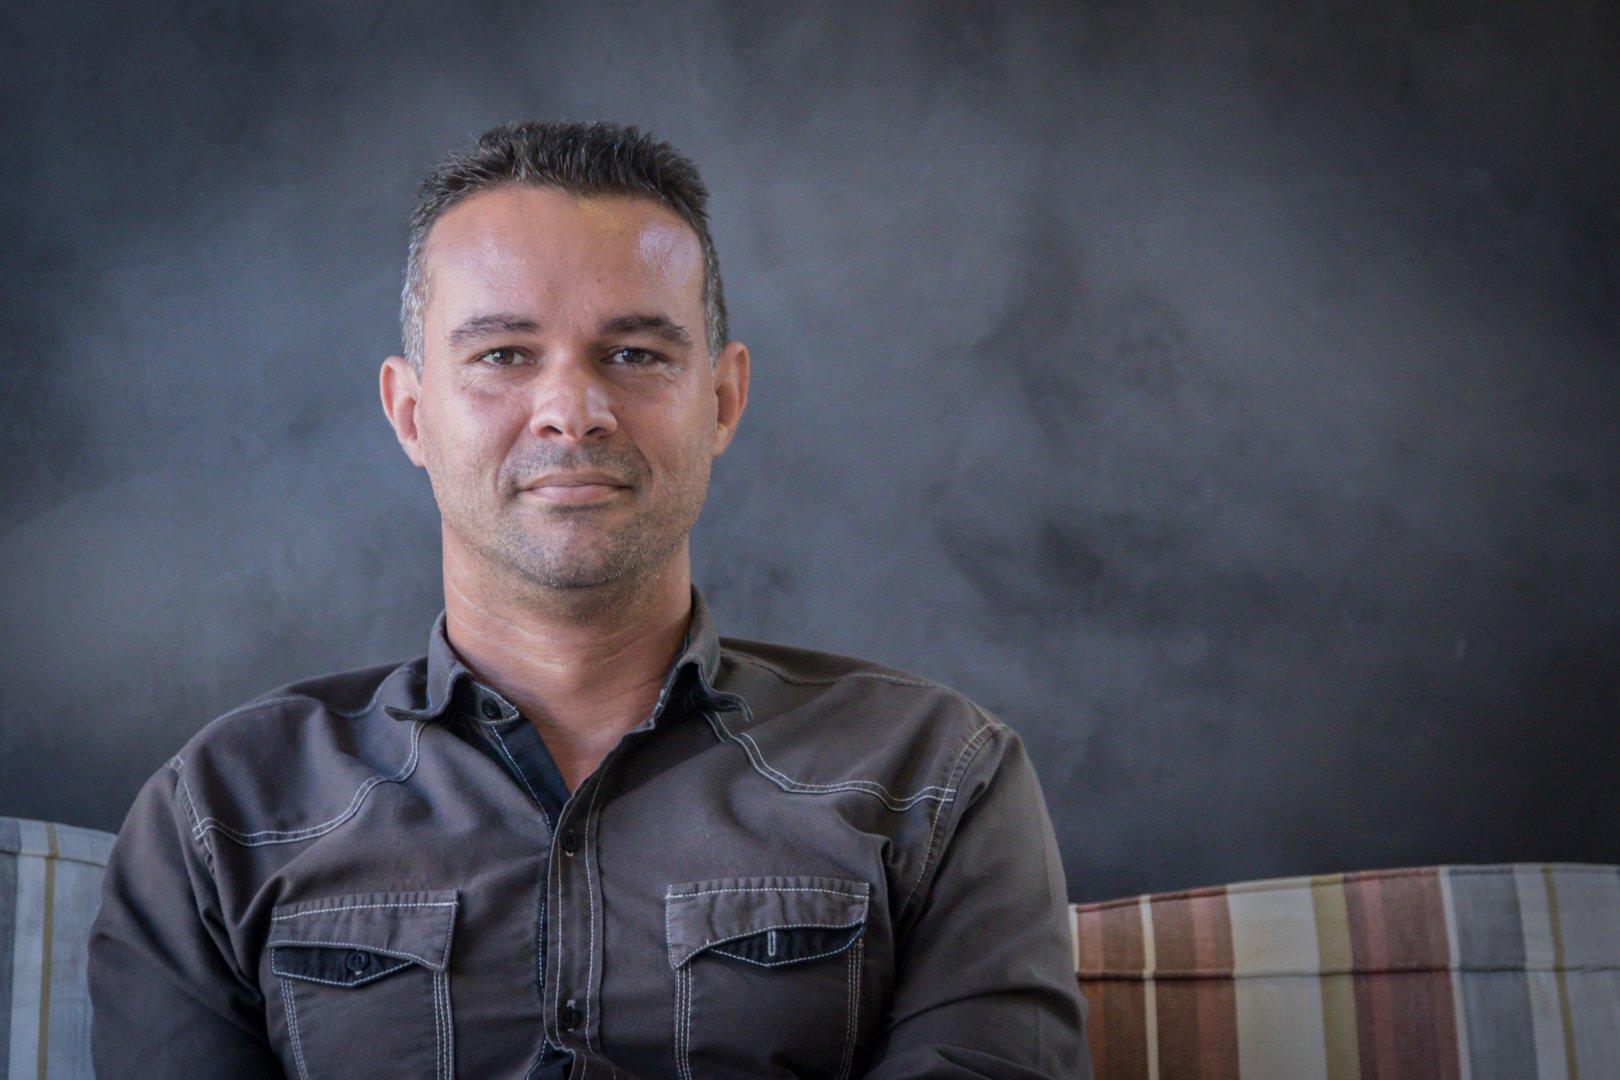 Johan Hoarau - Ingénieur des travaux